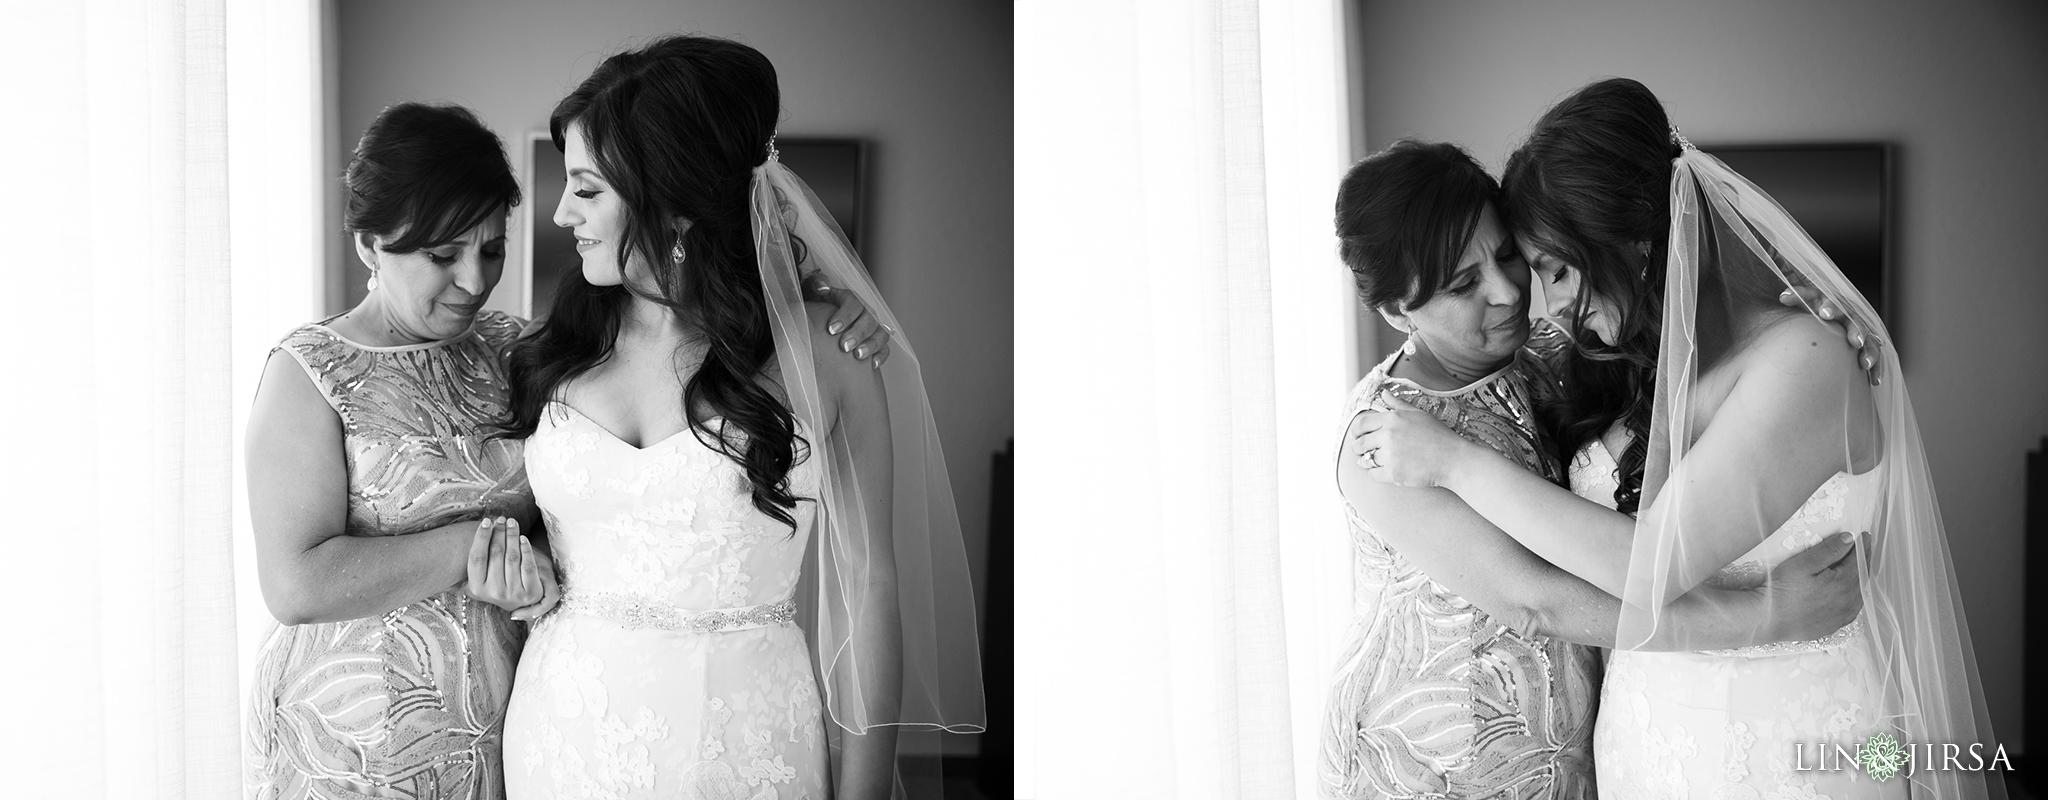 05-newport-beach-marriott-wedding-photography